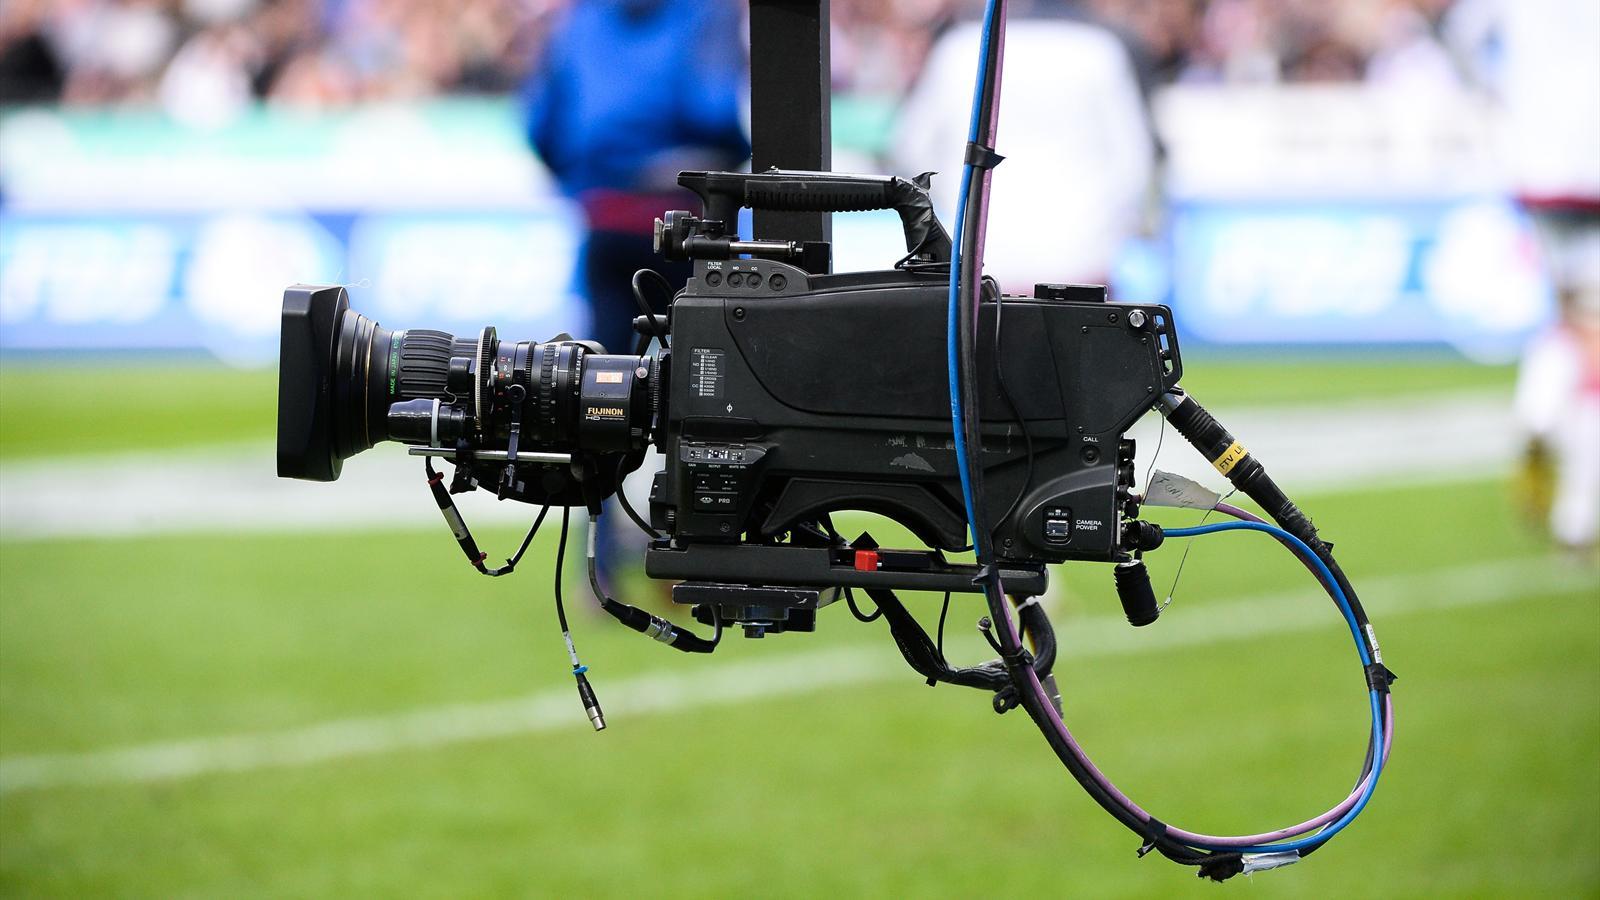 programme tv rugby champions cup pro d2 matches en direct l 39 agenda du 9 au 15 janvier. Black Bedroom Furniture Sets. Home Design Ideas